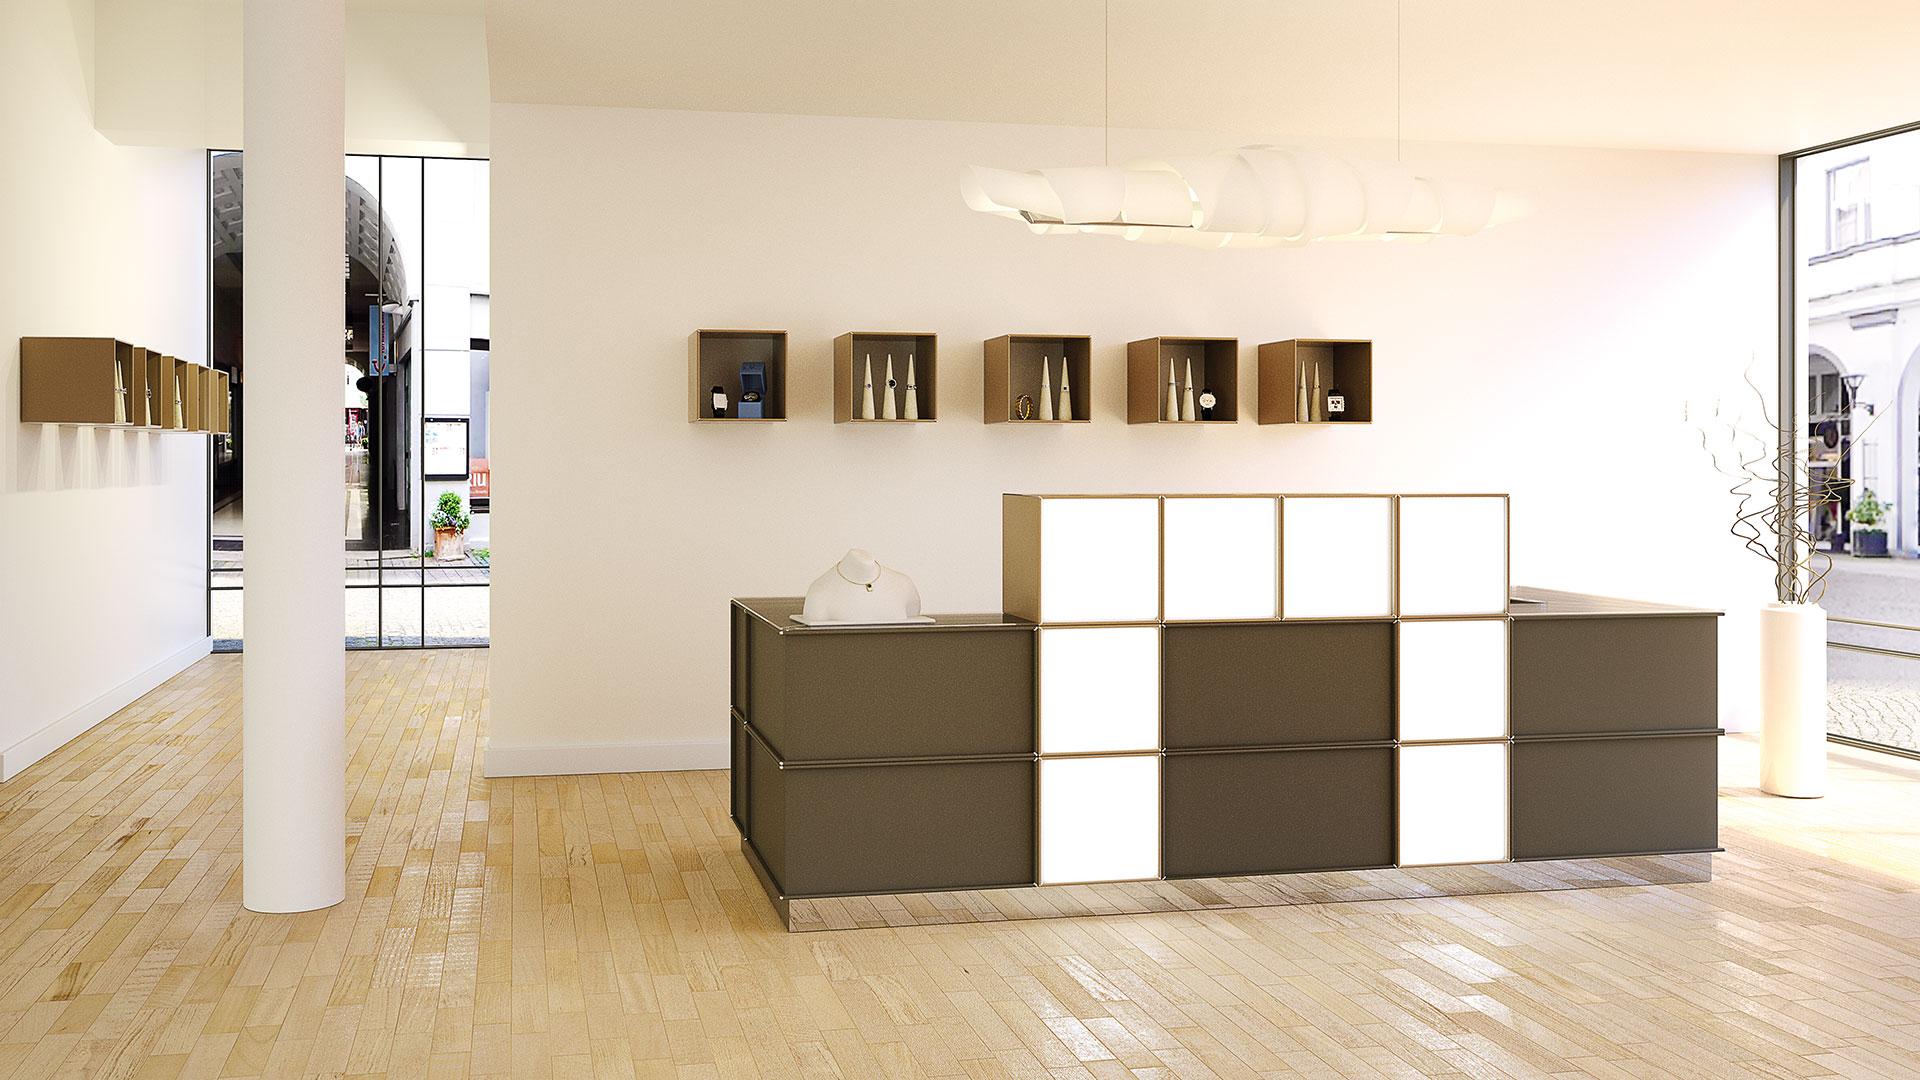 Design-Moebel-Stauraum-Thekenelement-Verkaufstresen-element-x-16-9